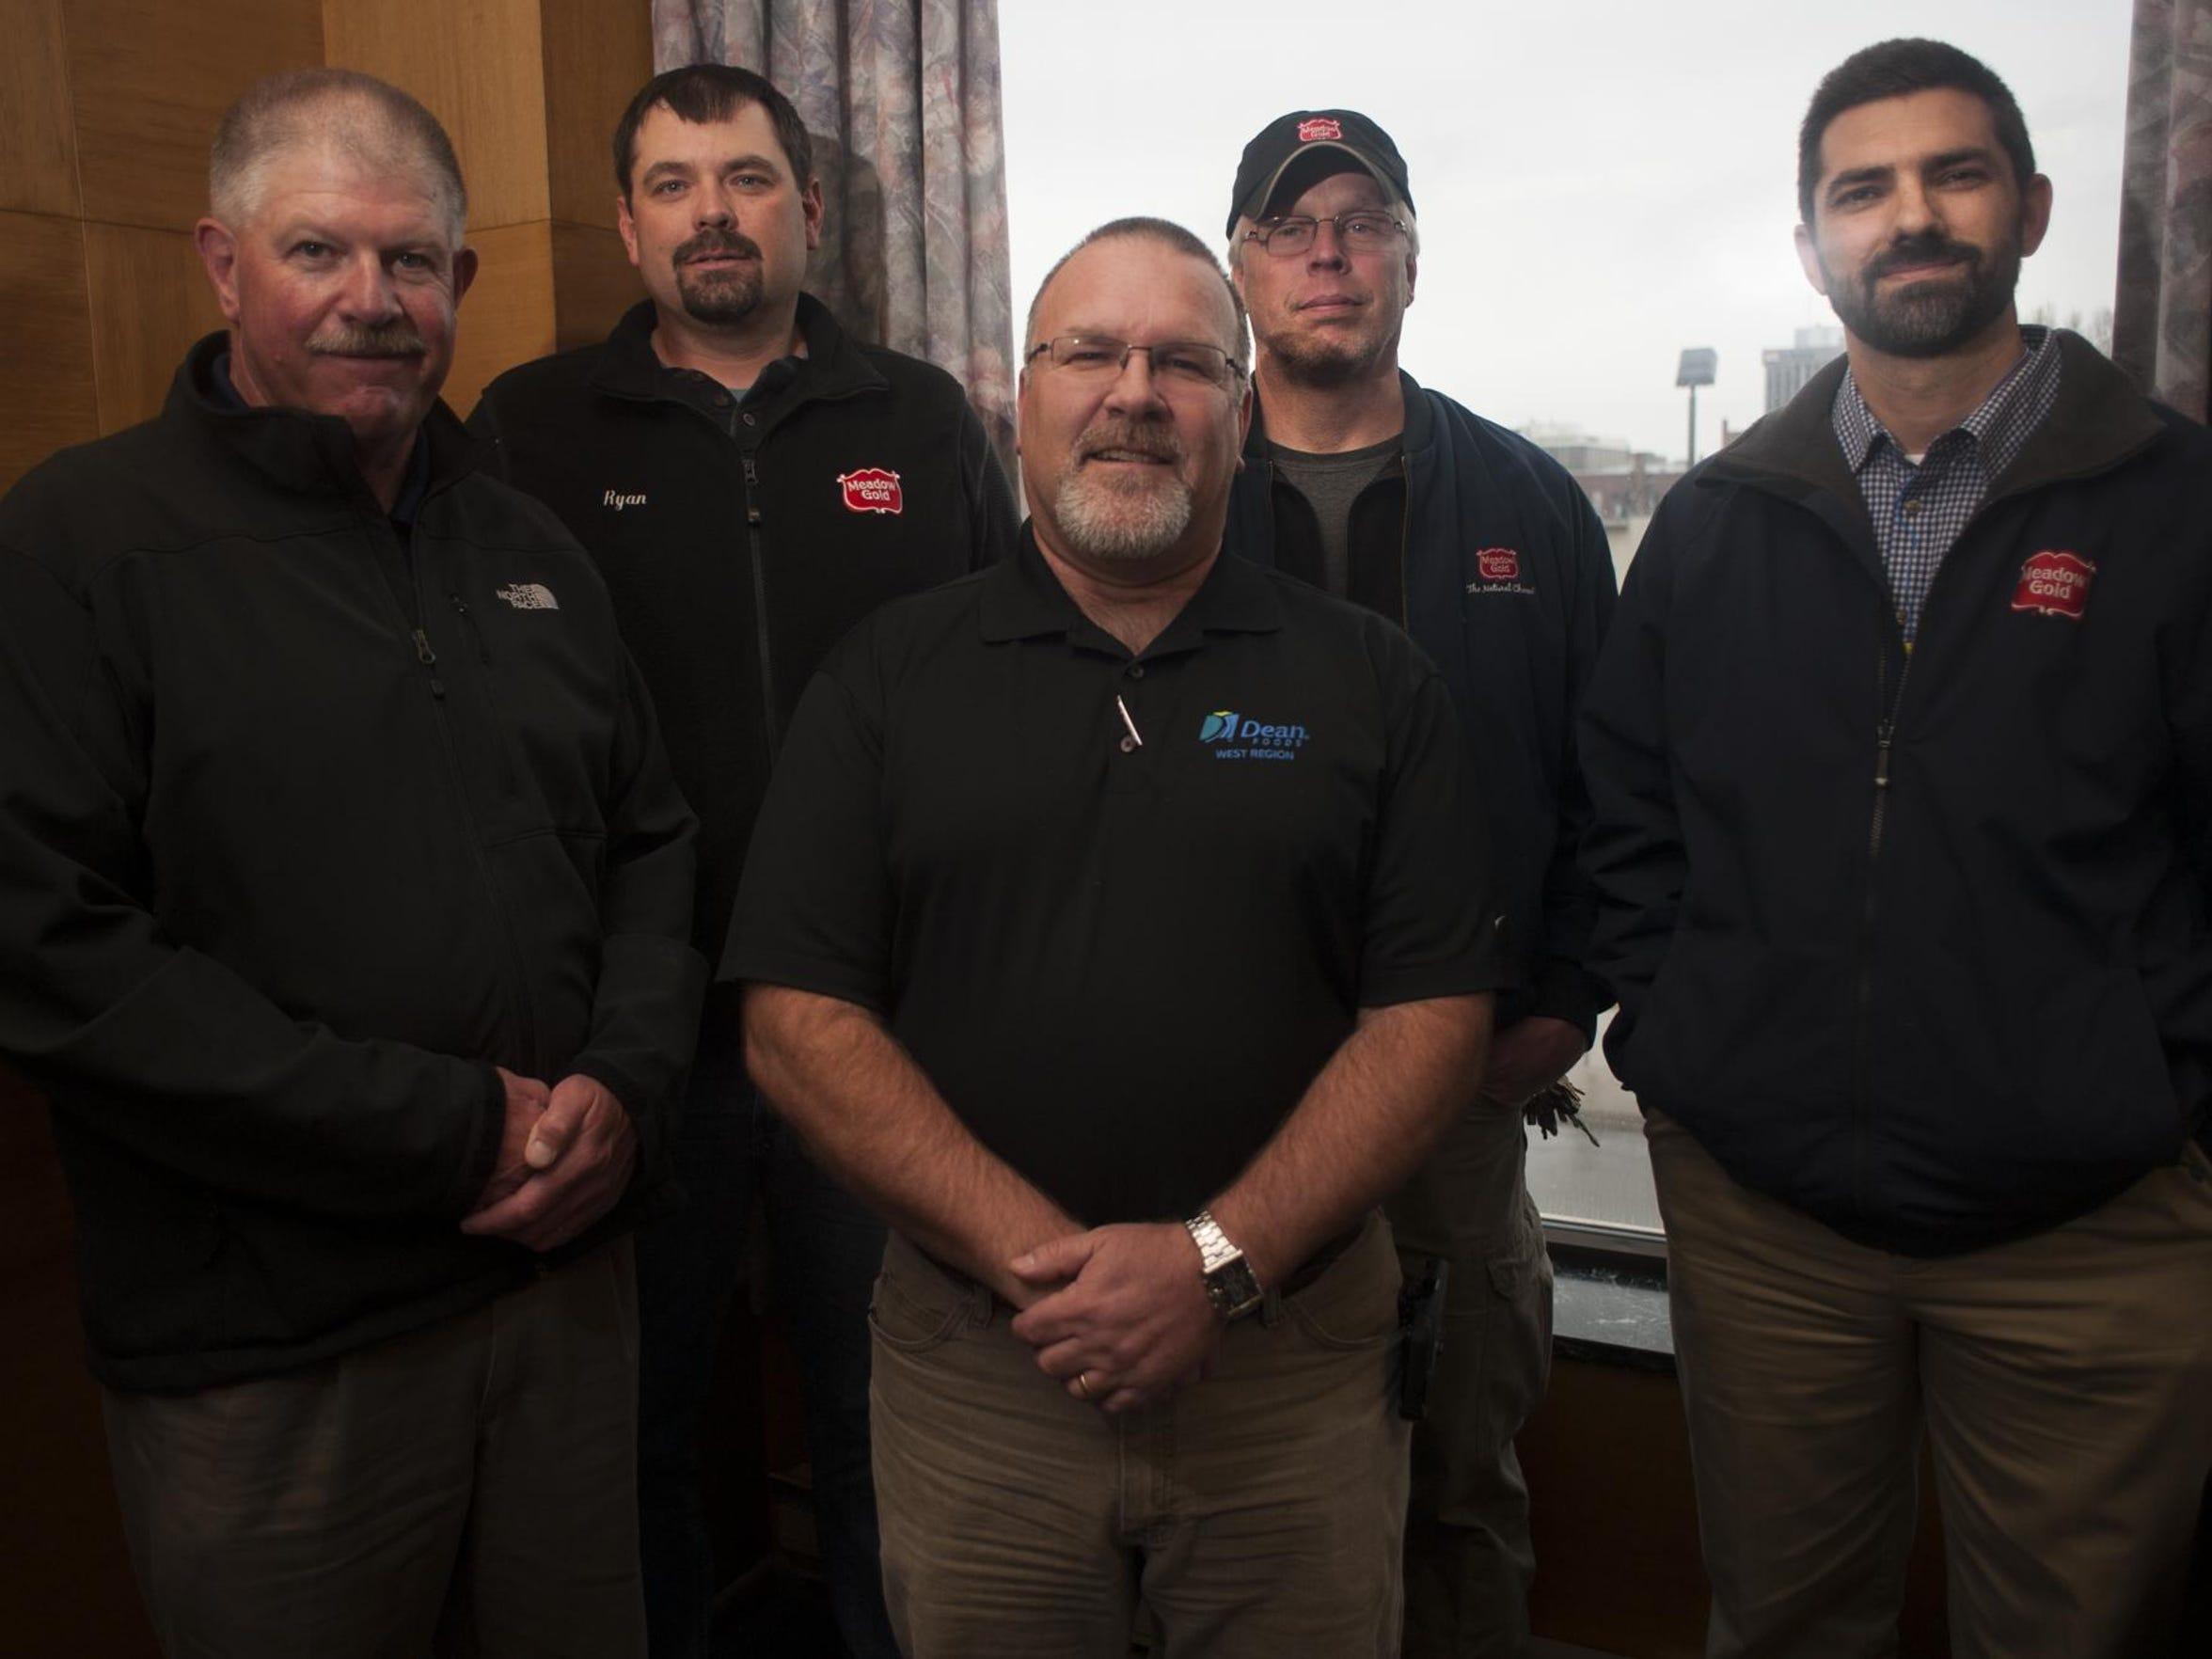 Left to right, Brian Herzog, Ryan Lynn, Todd Hansen,